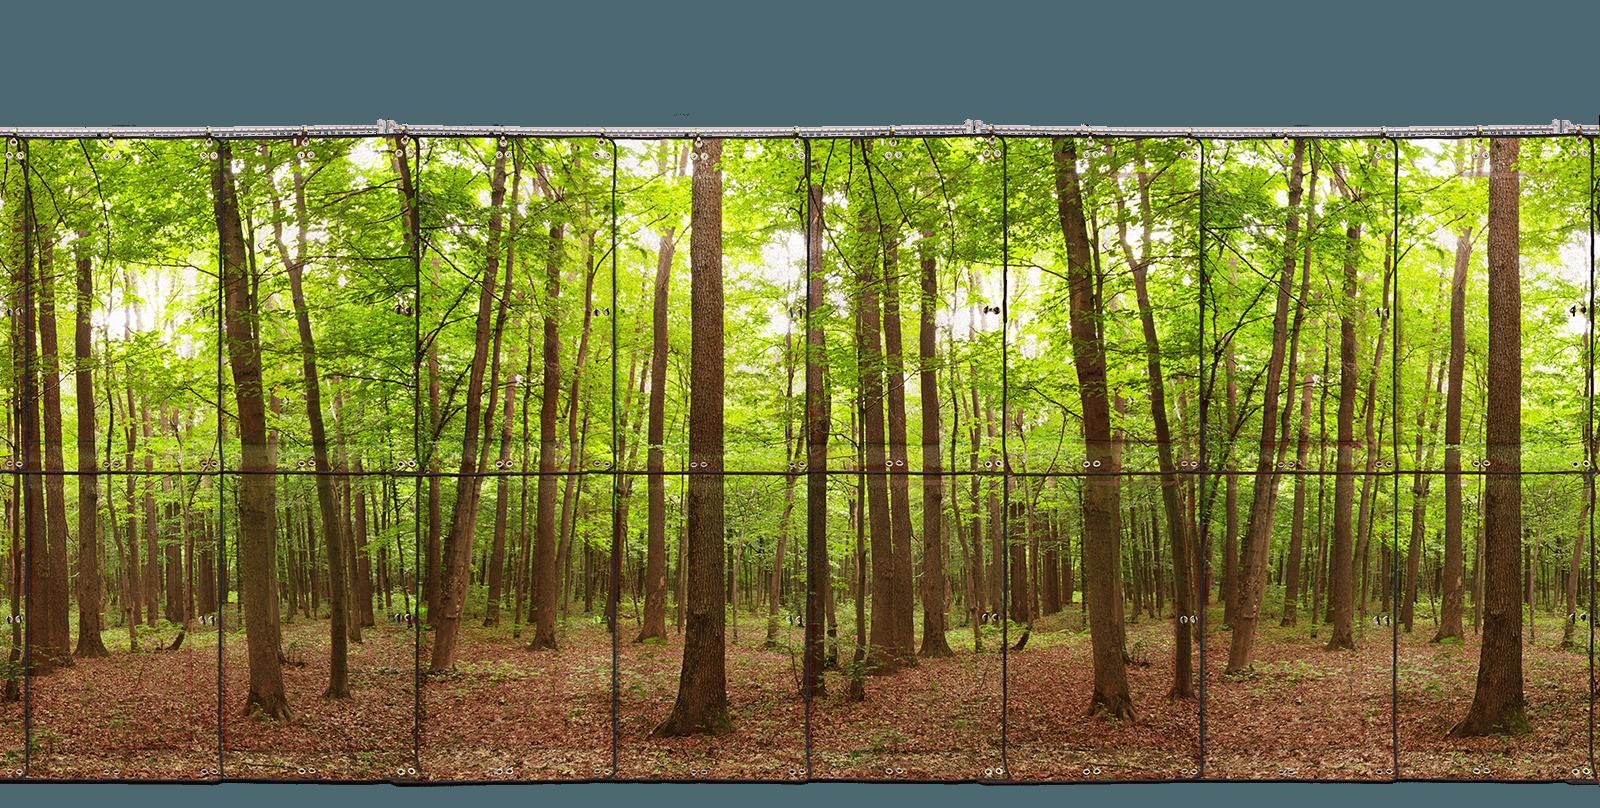 Environmental background